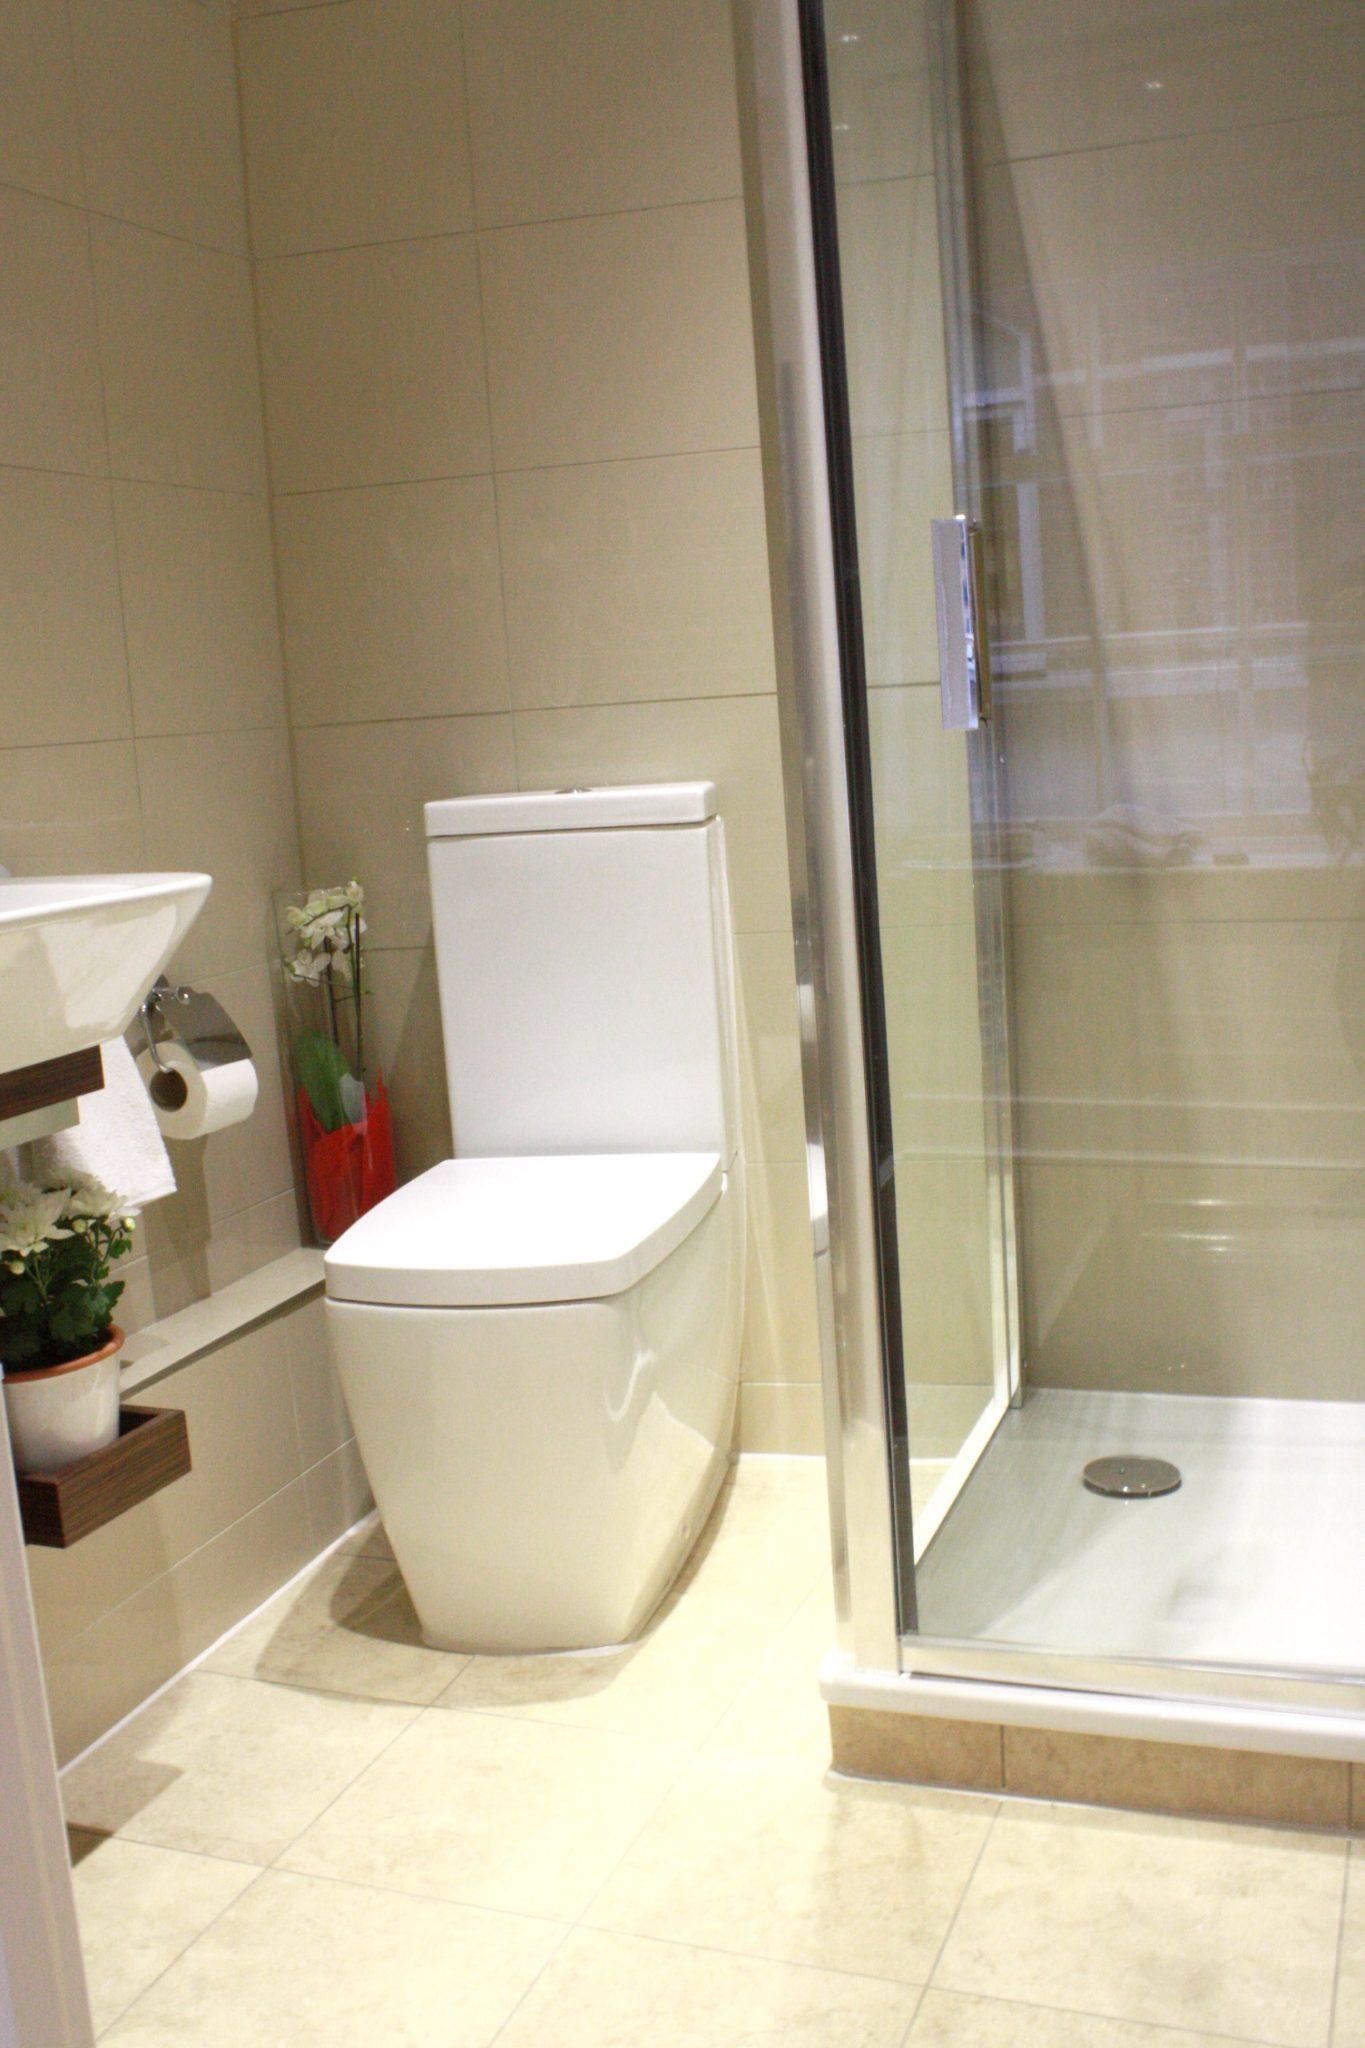 Liverpool Street Serviced Accommodation Artillery Lane Apartments Ensuite Bathroom